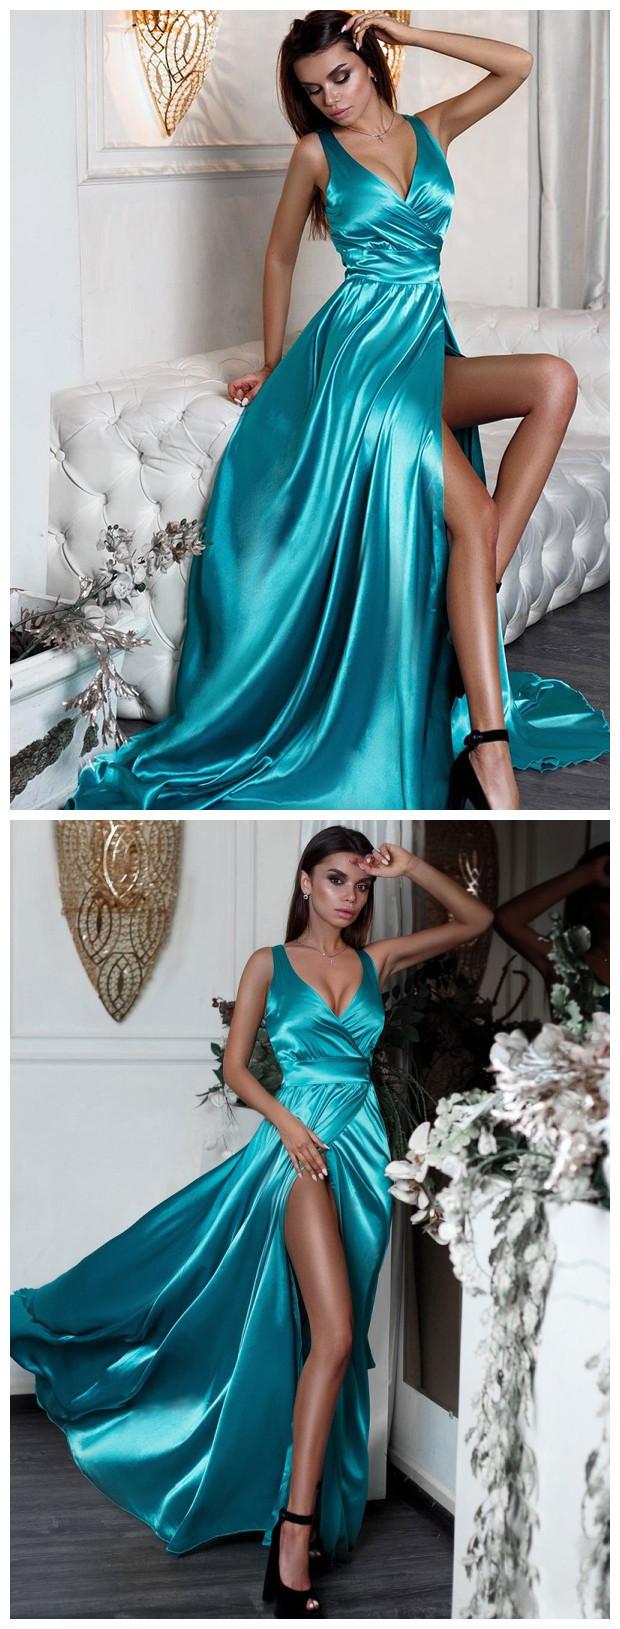 Sexy Split Long Prom Dresses Turquoise V-Neck Formal Evening Dress with Slit